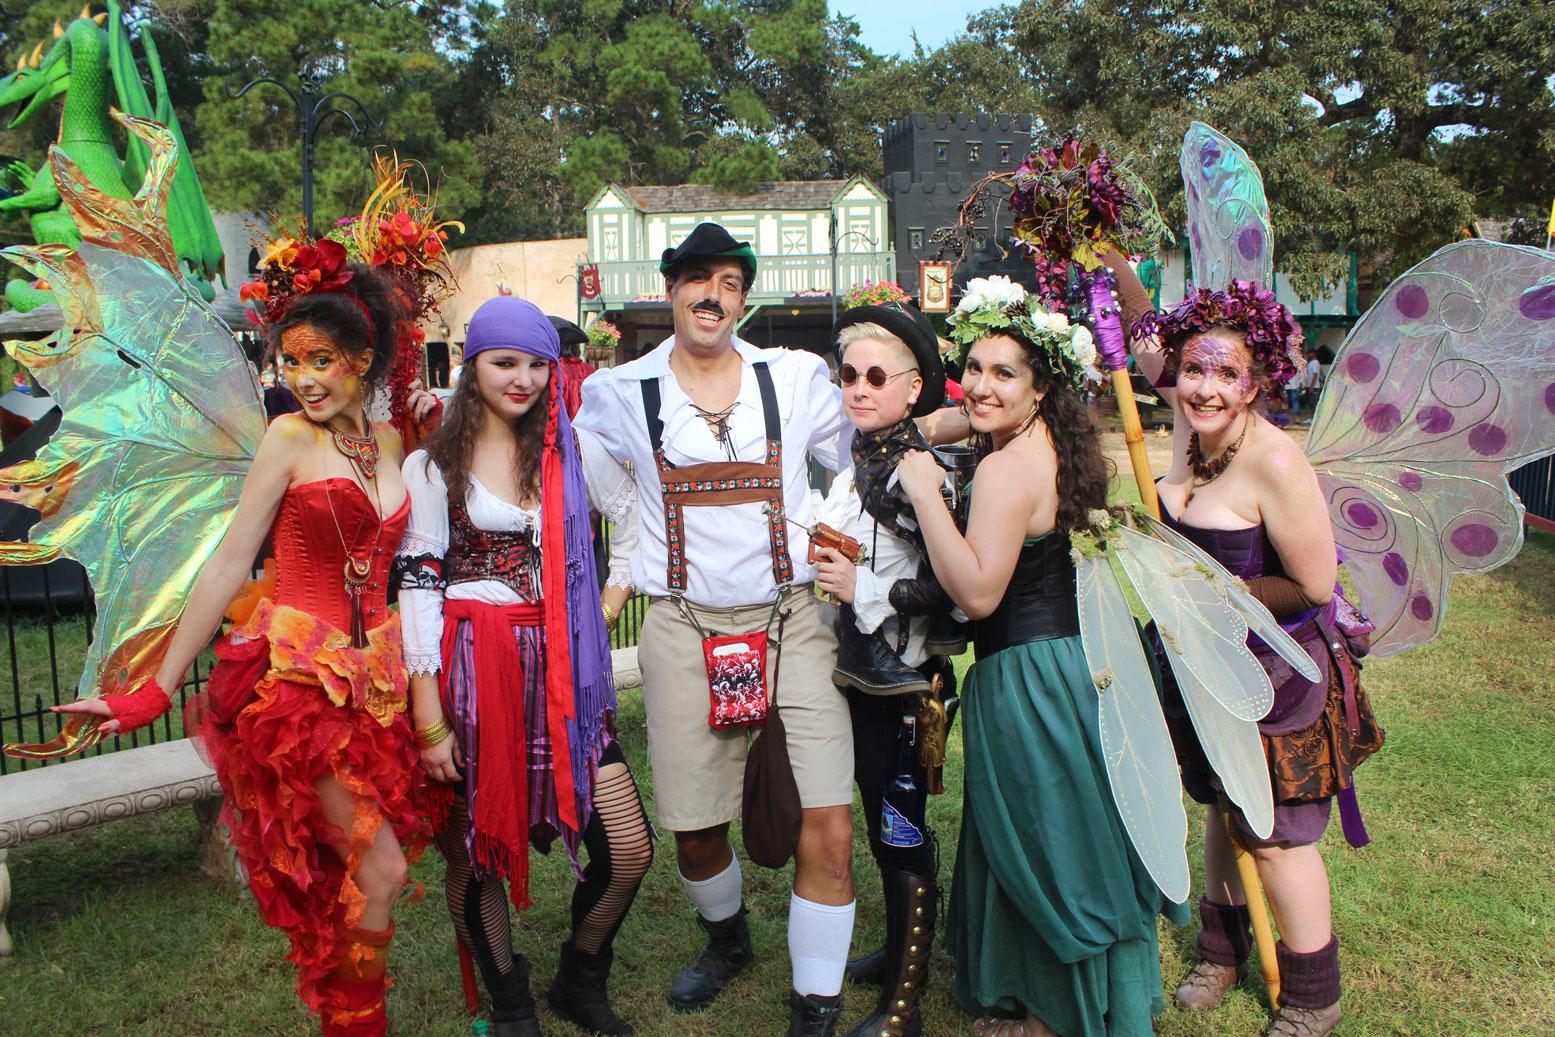 Good Weather Draws Crowd To Renaissance Fest  Houston